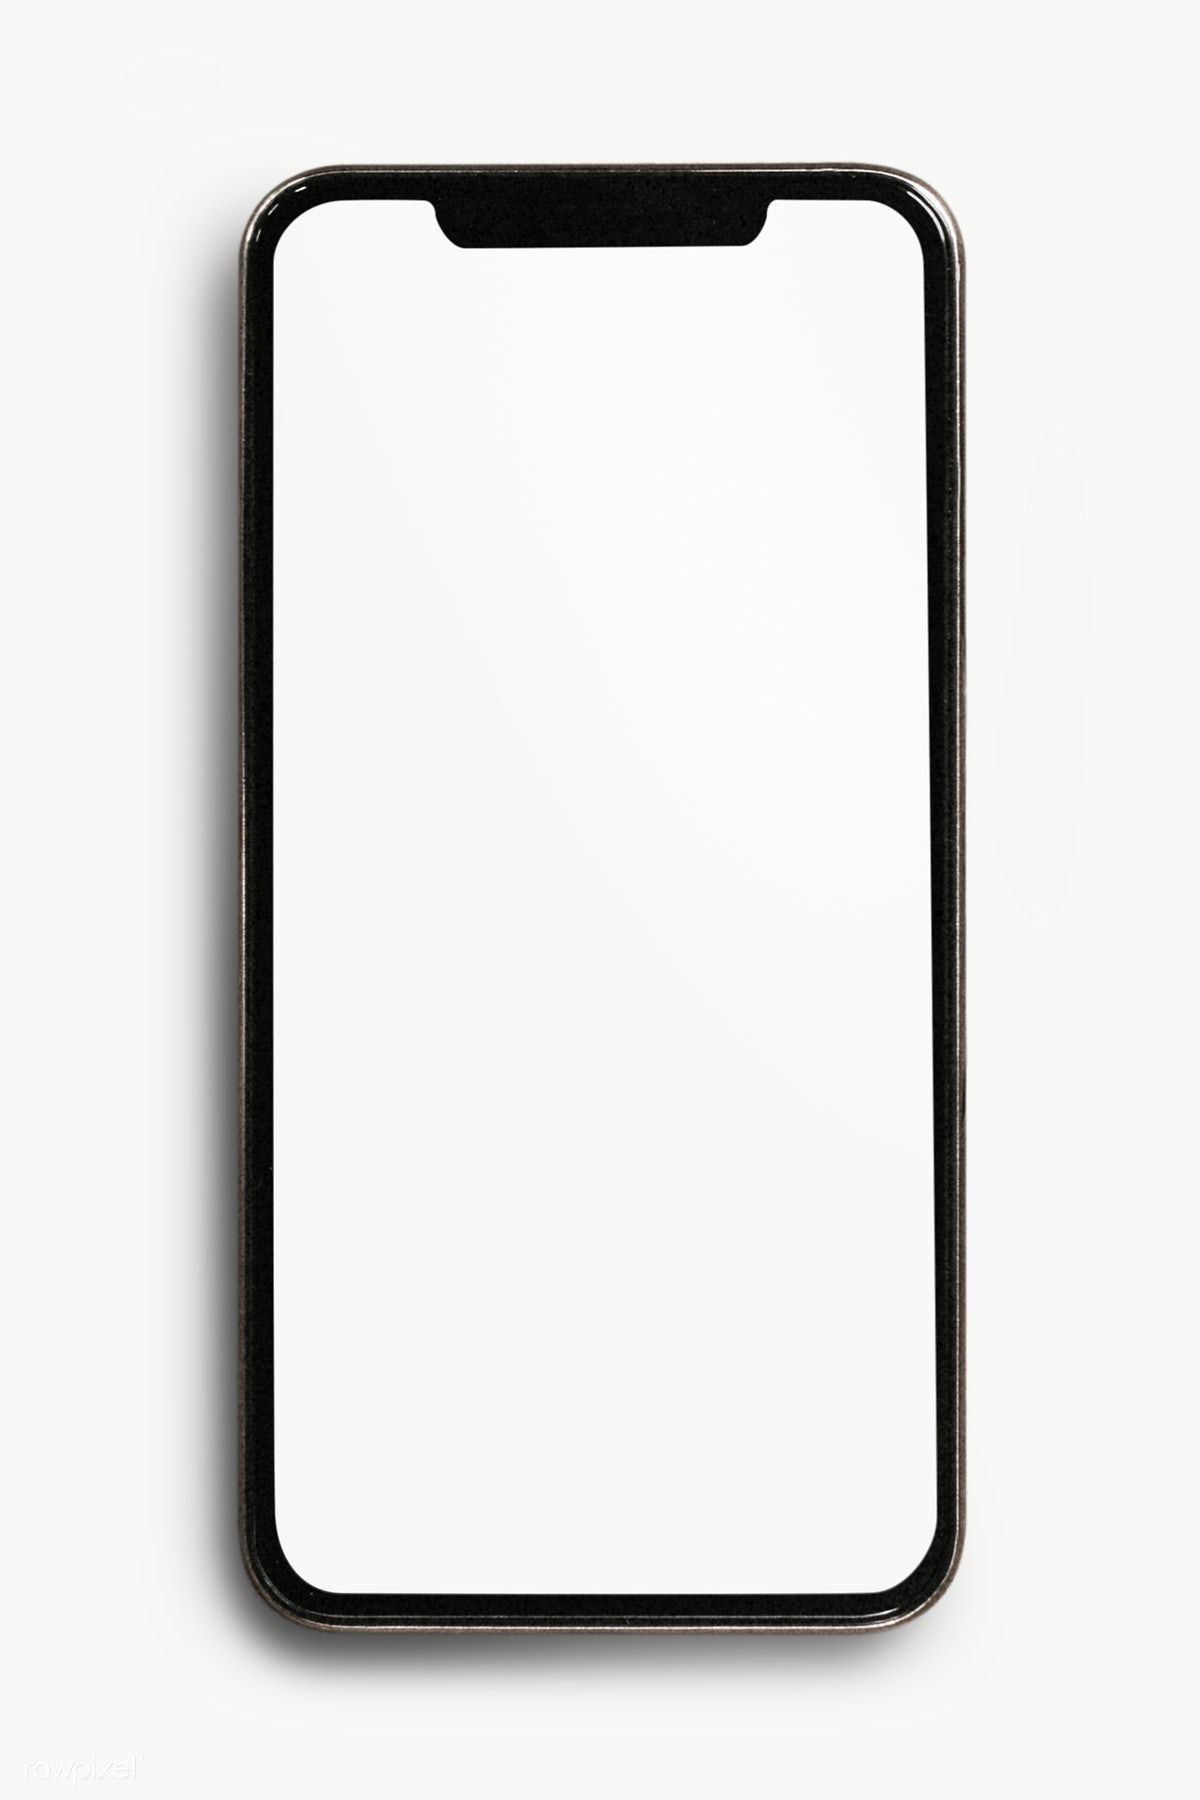 Blank Smartphone Screen Mockup Design Premium Image By Rawpixel Com Felix Mockup Design Powerpoint Background Design Graphic Design Mockup